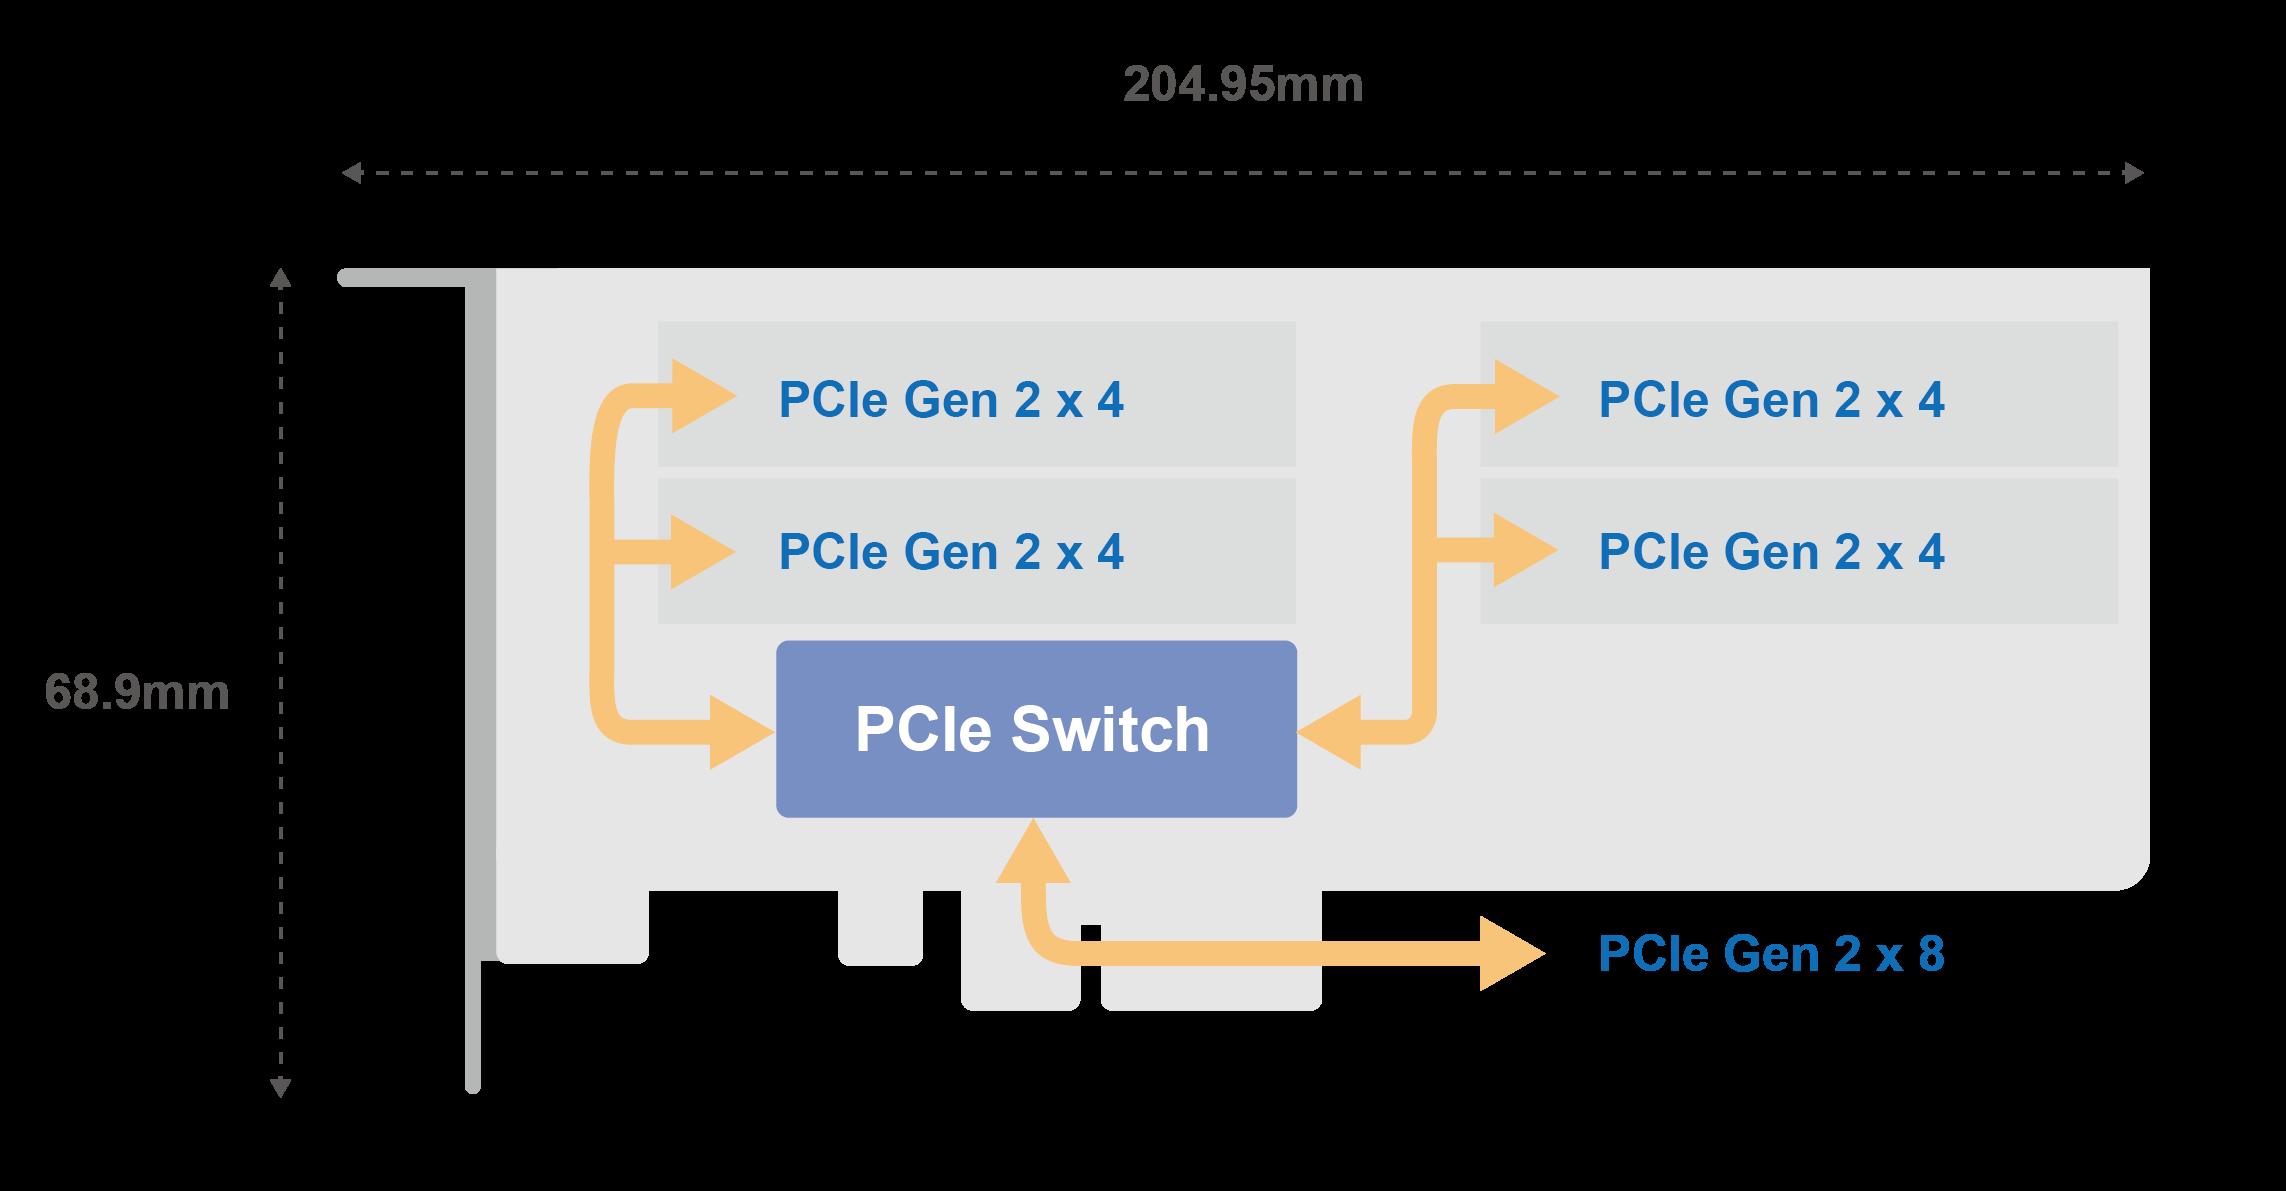 QNAP QM2-4P-284 クアッド M.2 22110/2280 PCIe NVMe SSD拡張カード